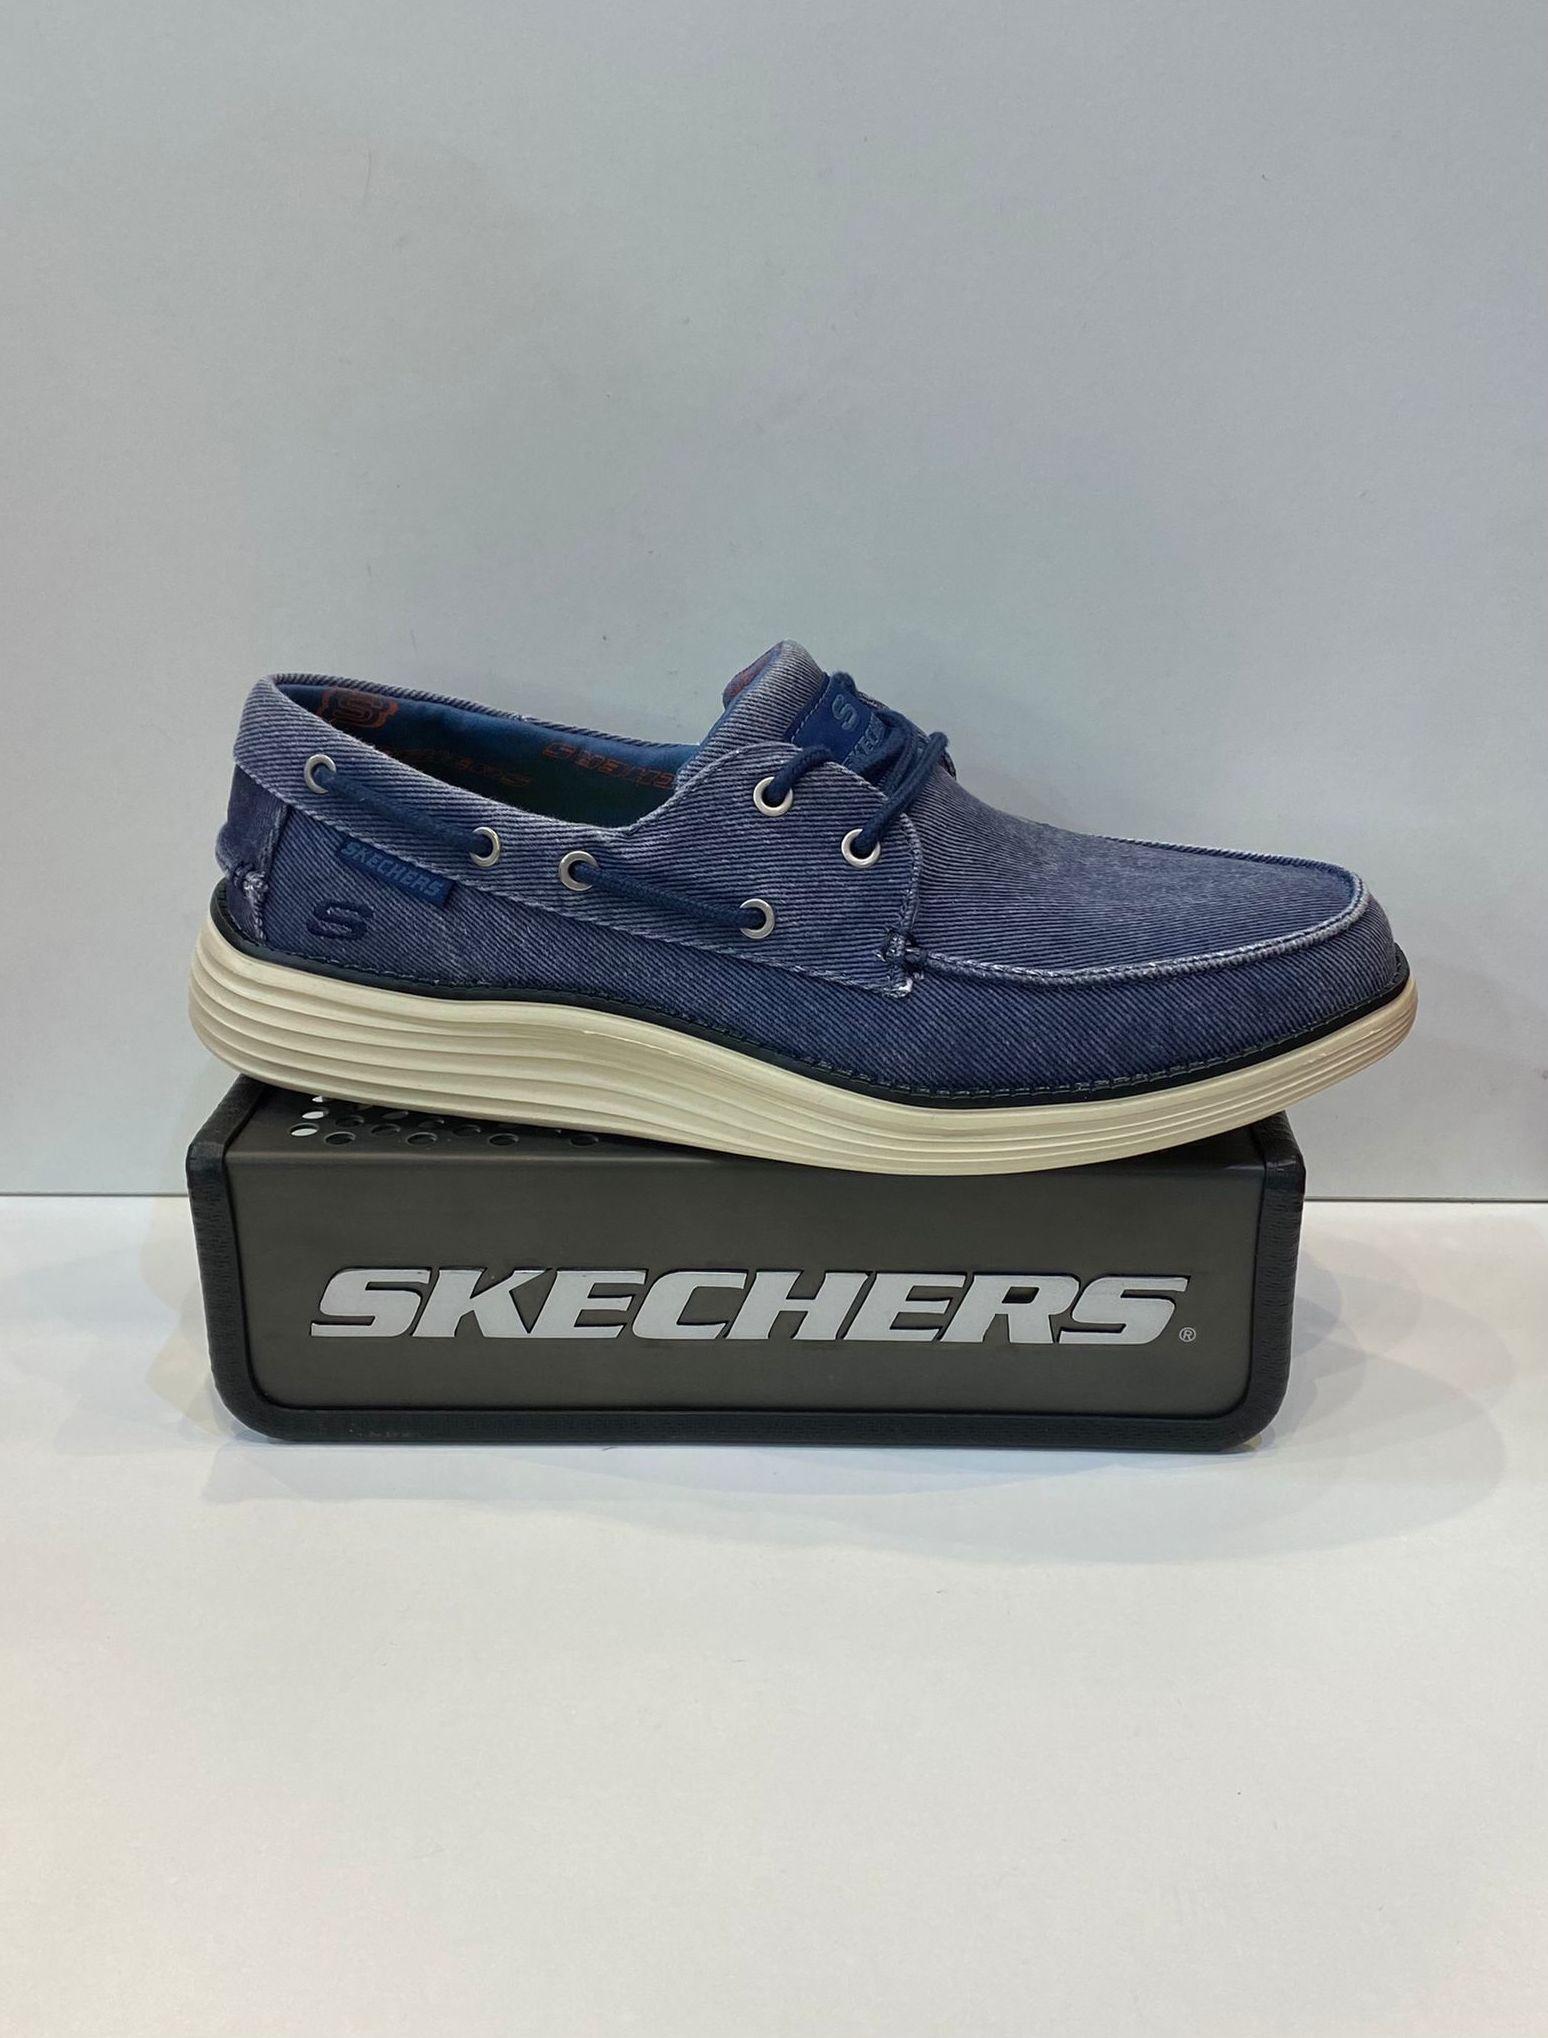 Blucher d'home, de la marca Skechers, plantilla Classic Fit    Air-Cooled ¡Memory Foam, sola de resalite 69.95€